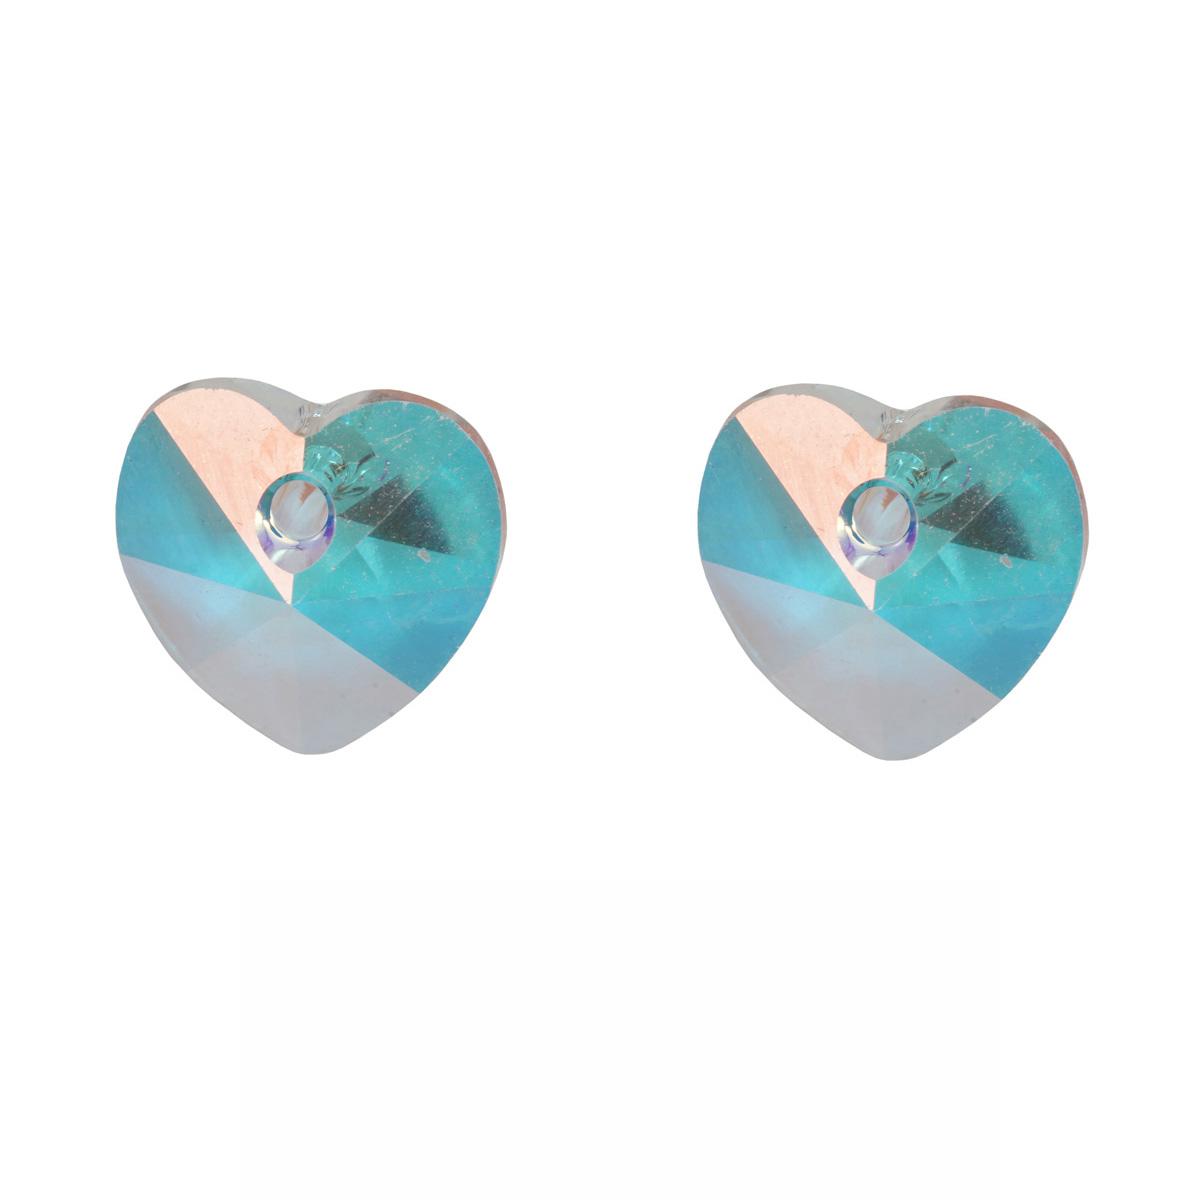 433-68-301 Подвеска Сердечко Crystal AB 10,3x10мм. 2 шт. Preciosa